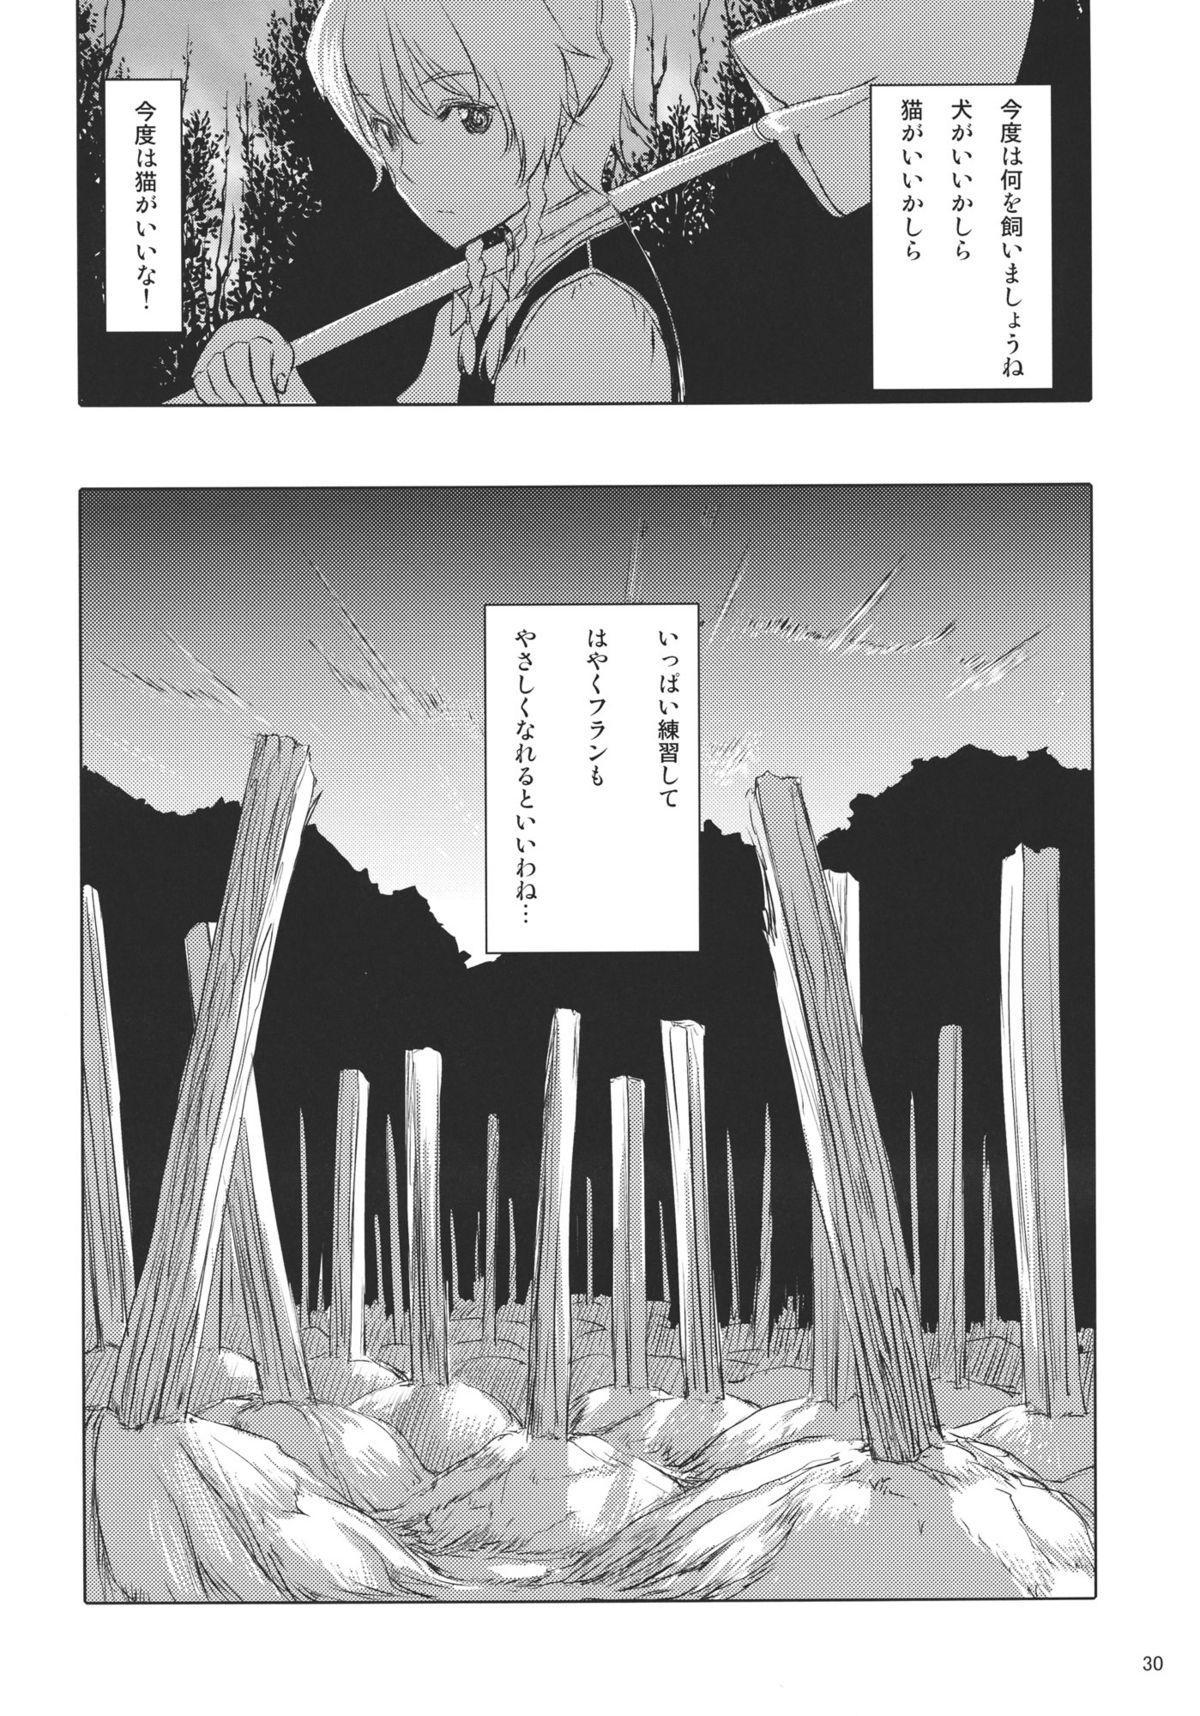 Flan-chan Infinity 31